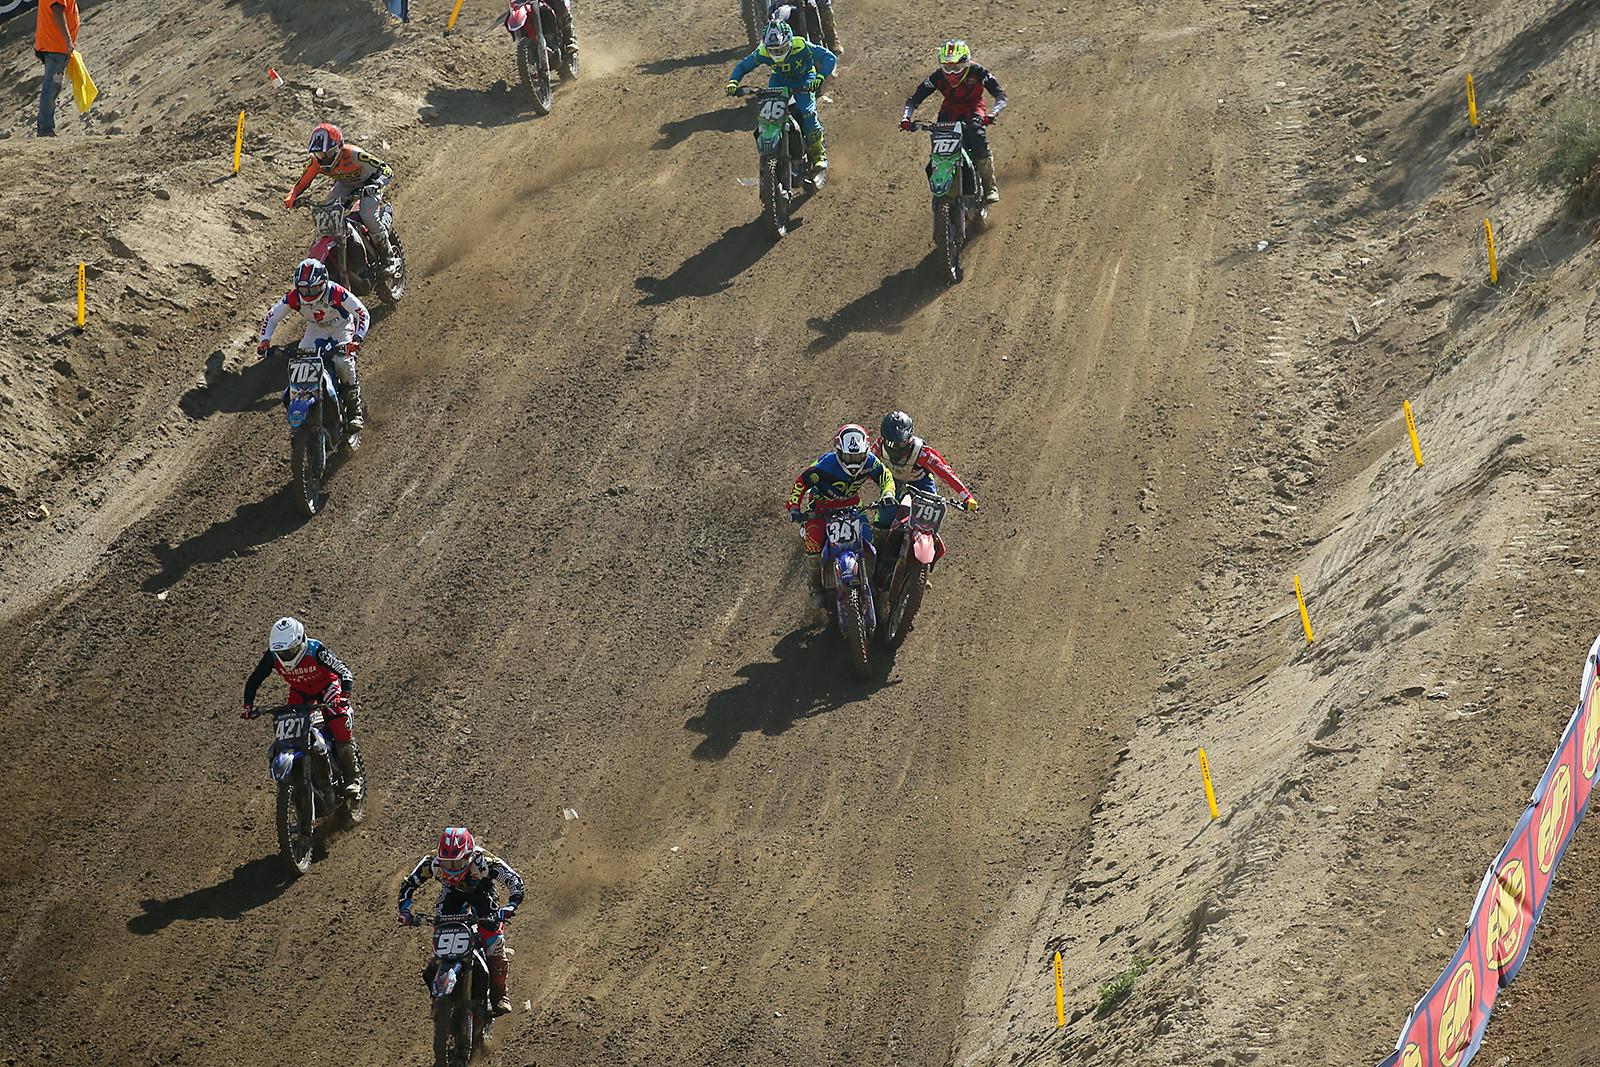 Whoa - Vital MX Pit Bits: Glen Helen - Motocross Pictures - Vital MX